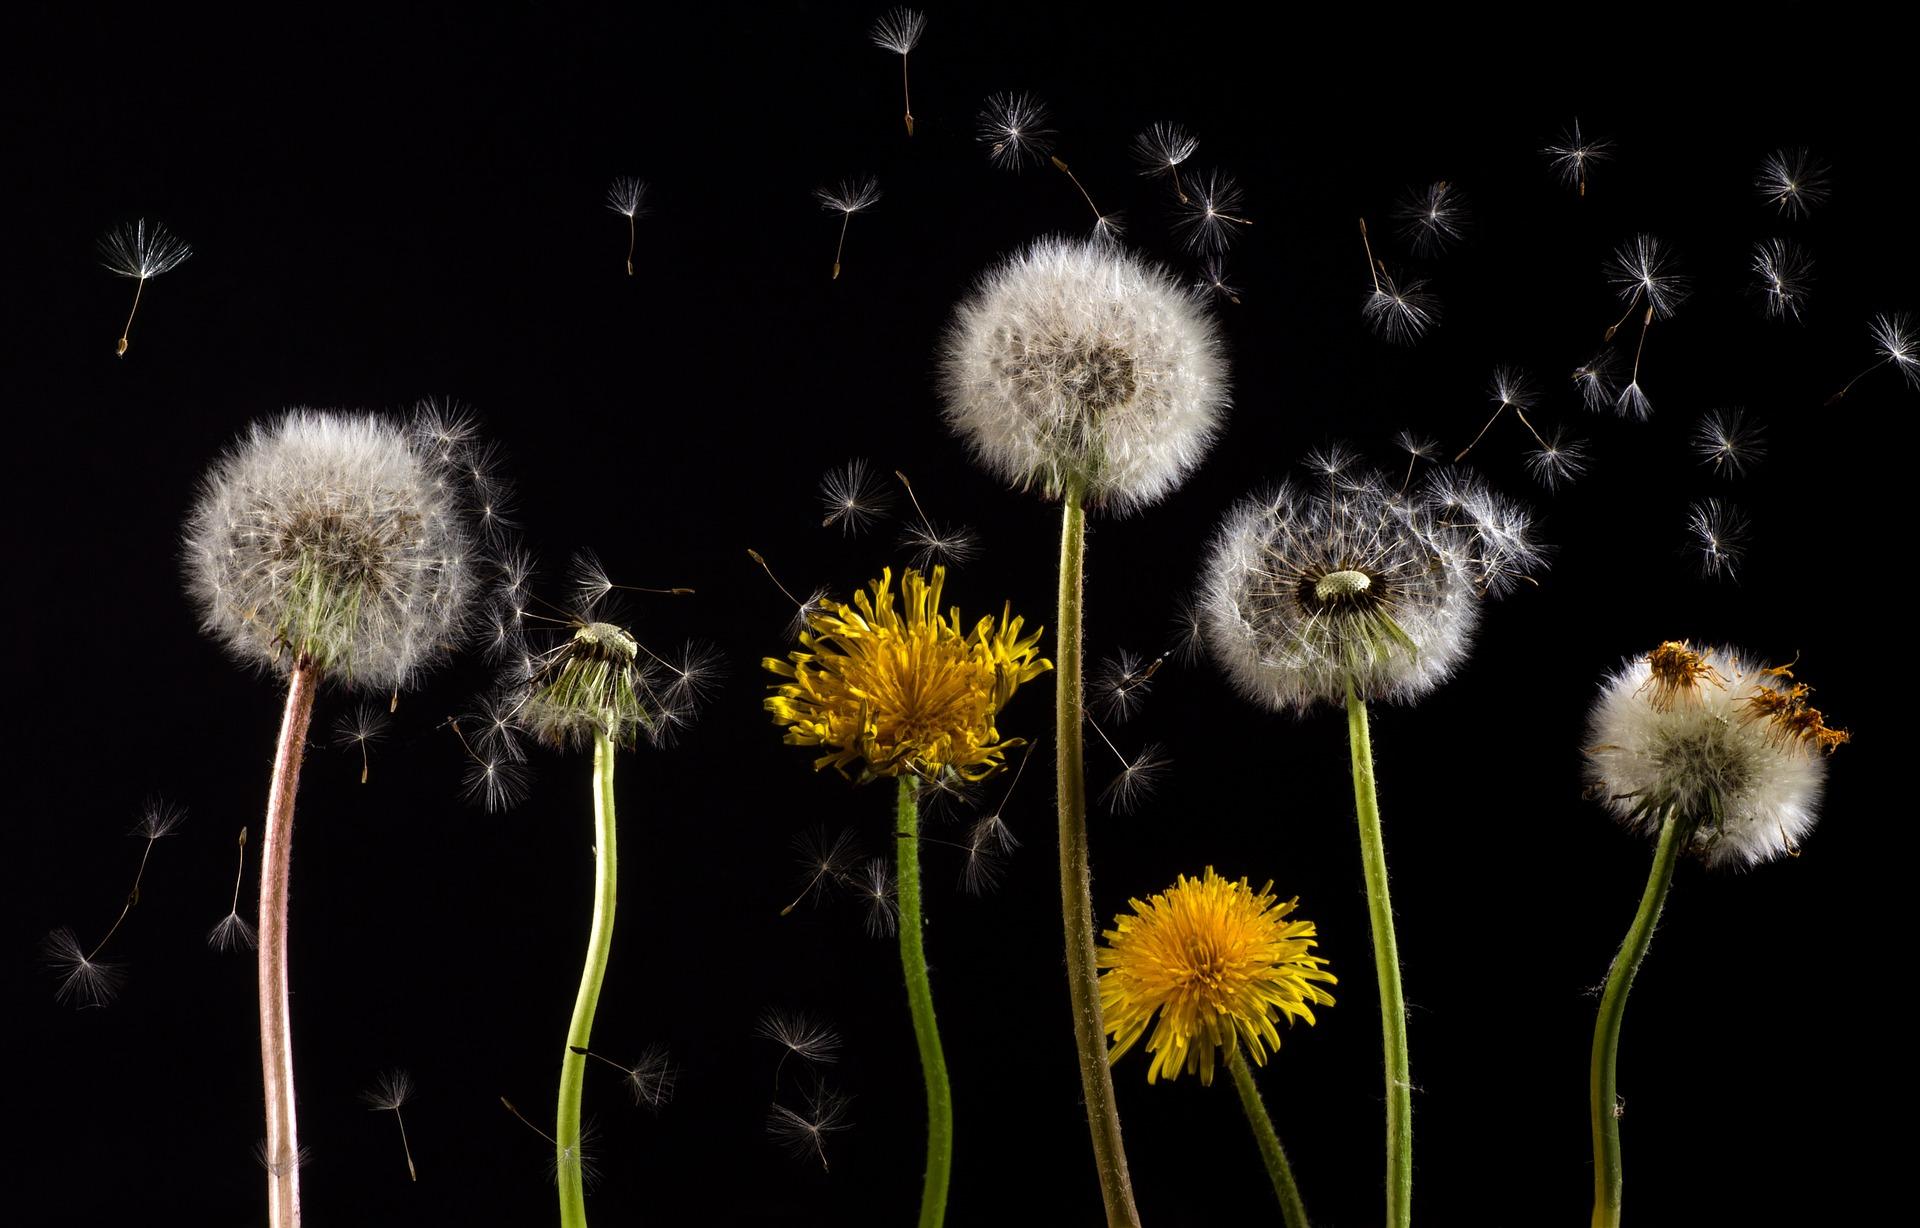 Dandelions blowing